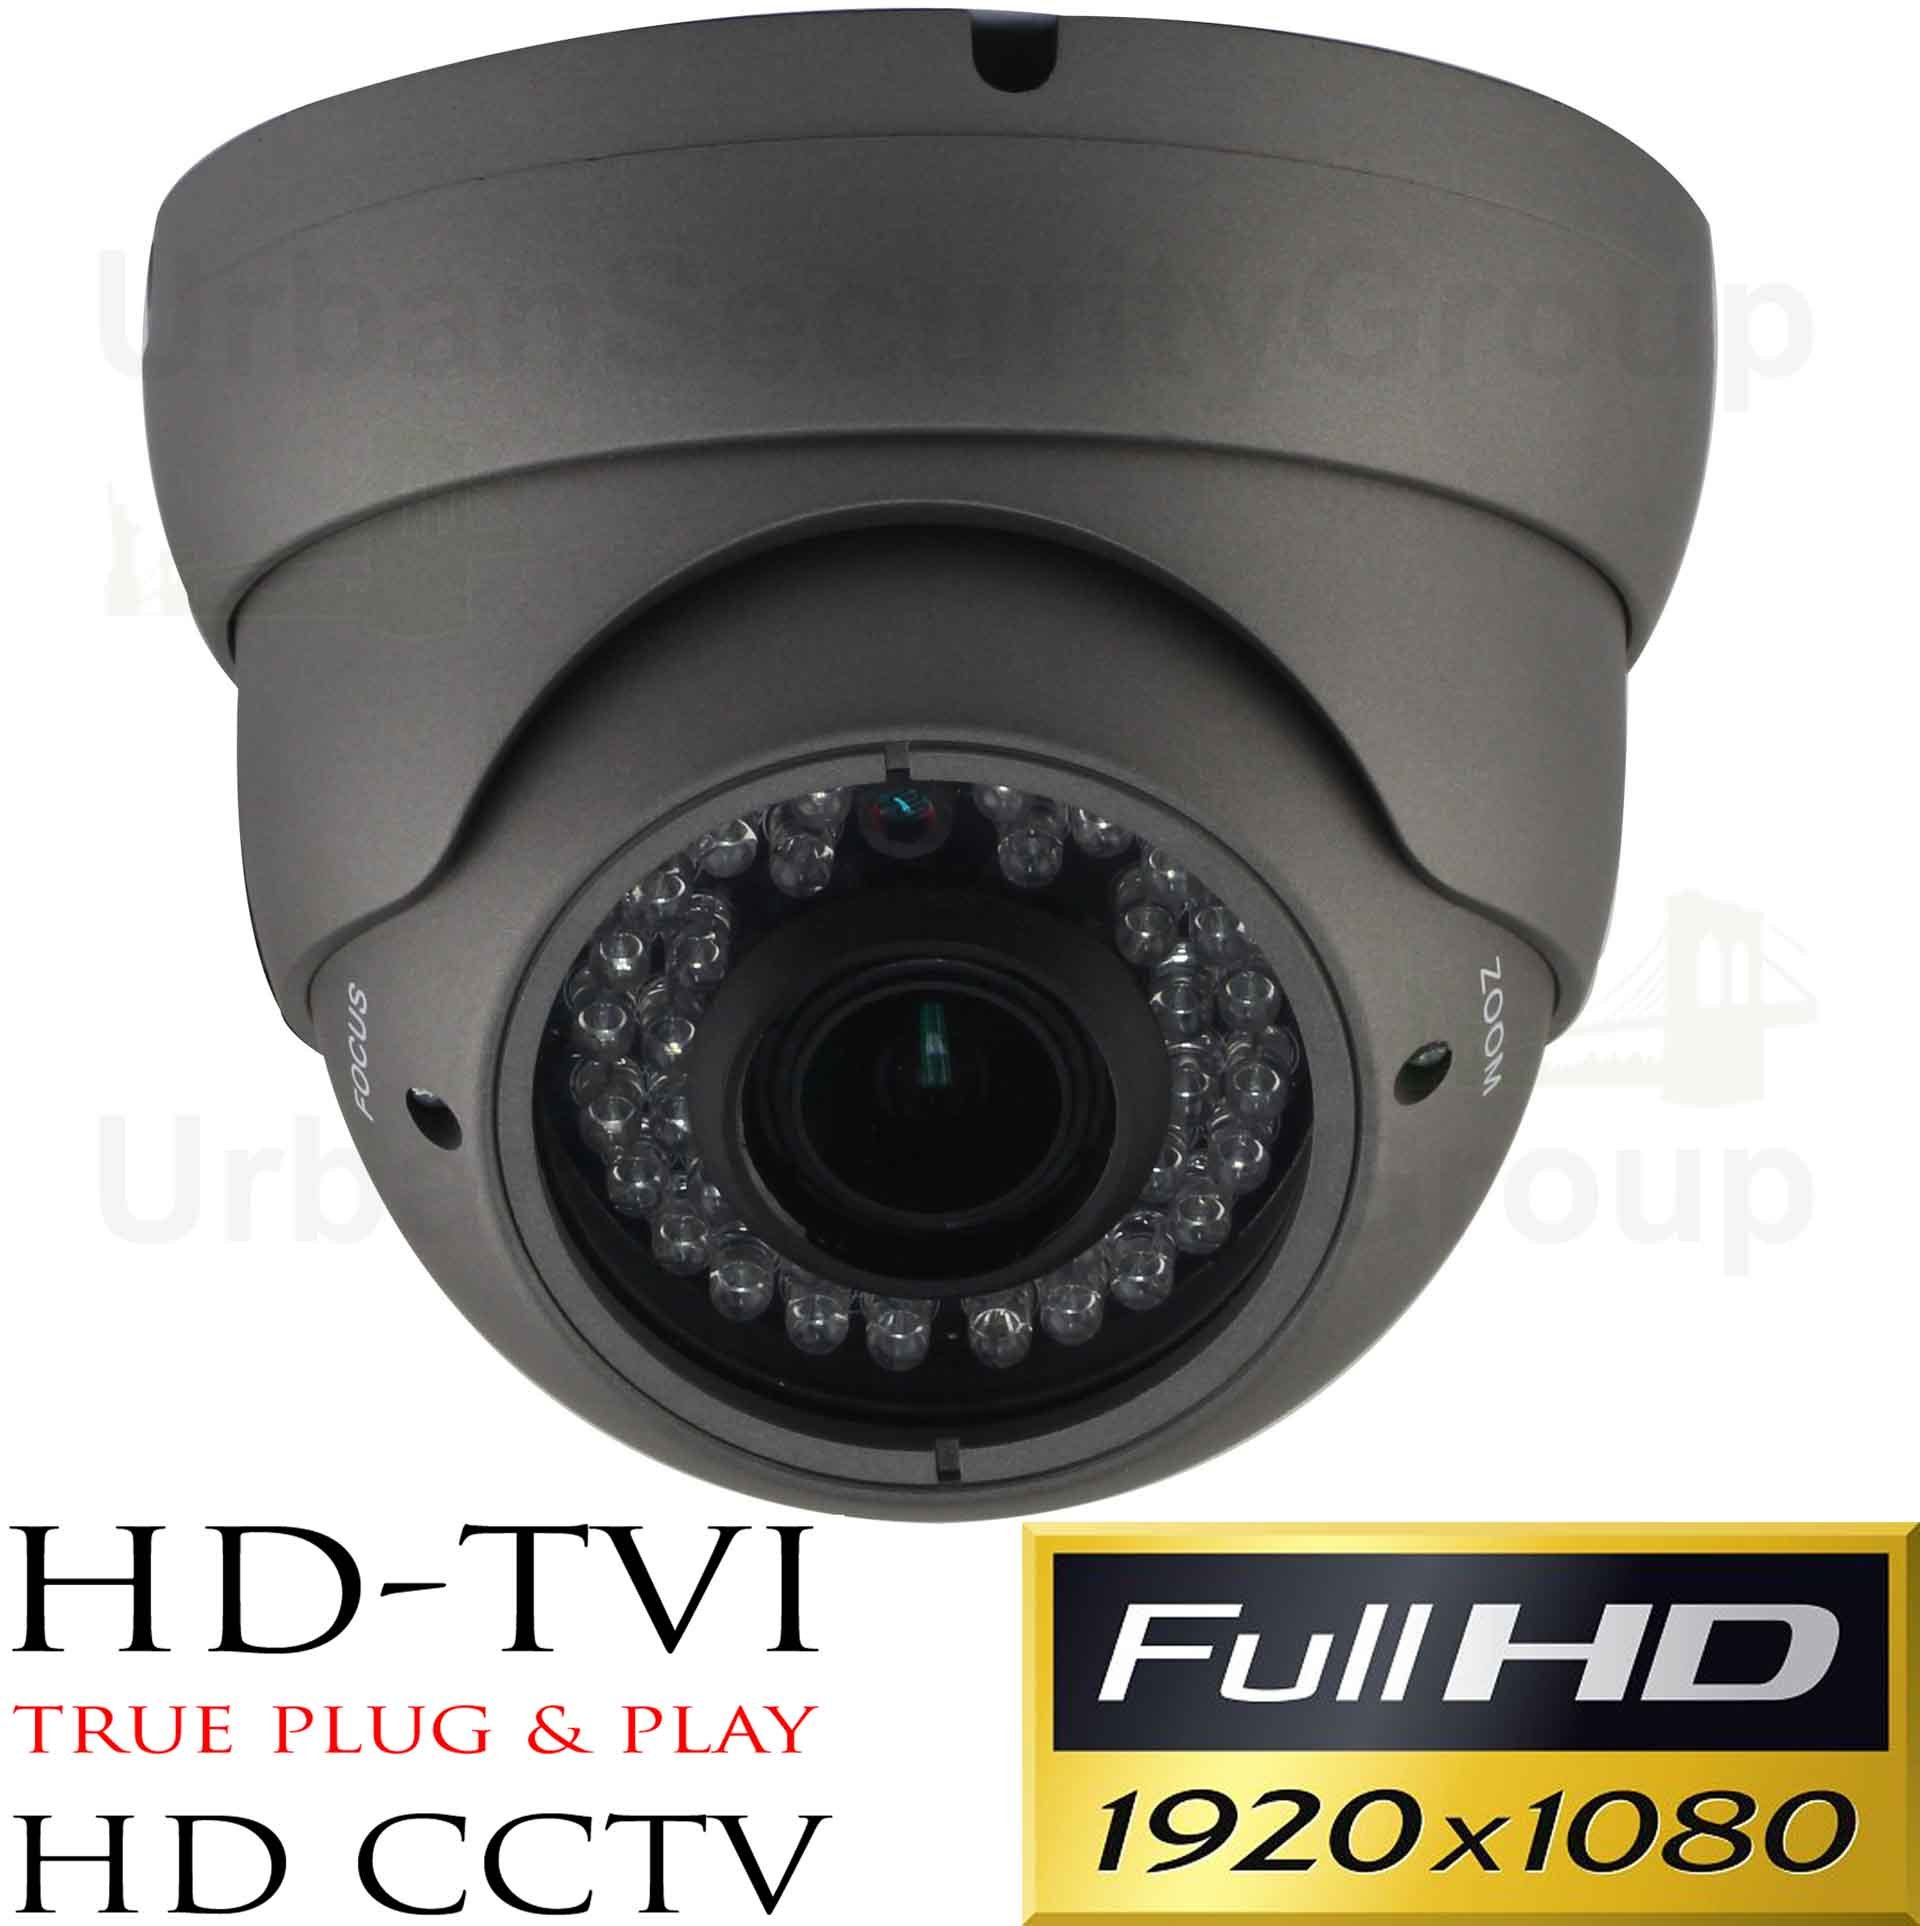 Urban Security Group Panasonic Chipset 2MP 1080P @ 30FPS Dome Security Camera : 6-in-1 BNC CCTV Format HD-SDI, EX-SDI, HD-TVI, HD-CVI, AHD + Analog : 2.8-12mm Vari-Focal Lens, IR LEDs, Business Grade by Urban Security Group